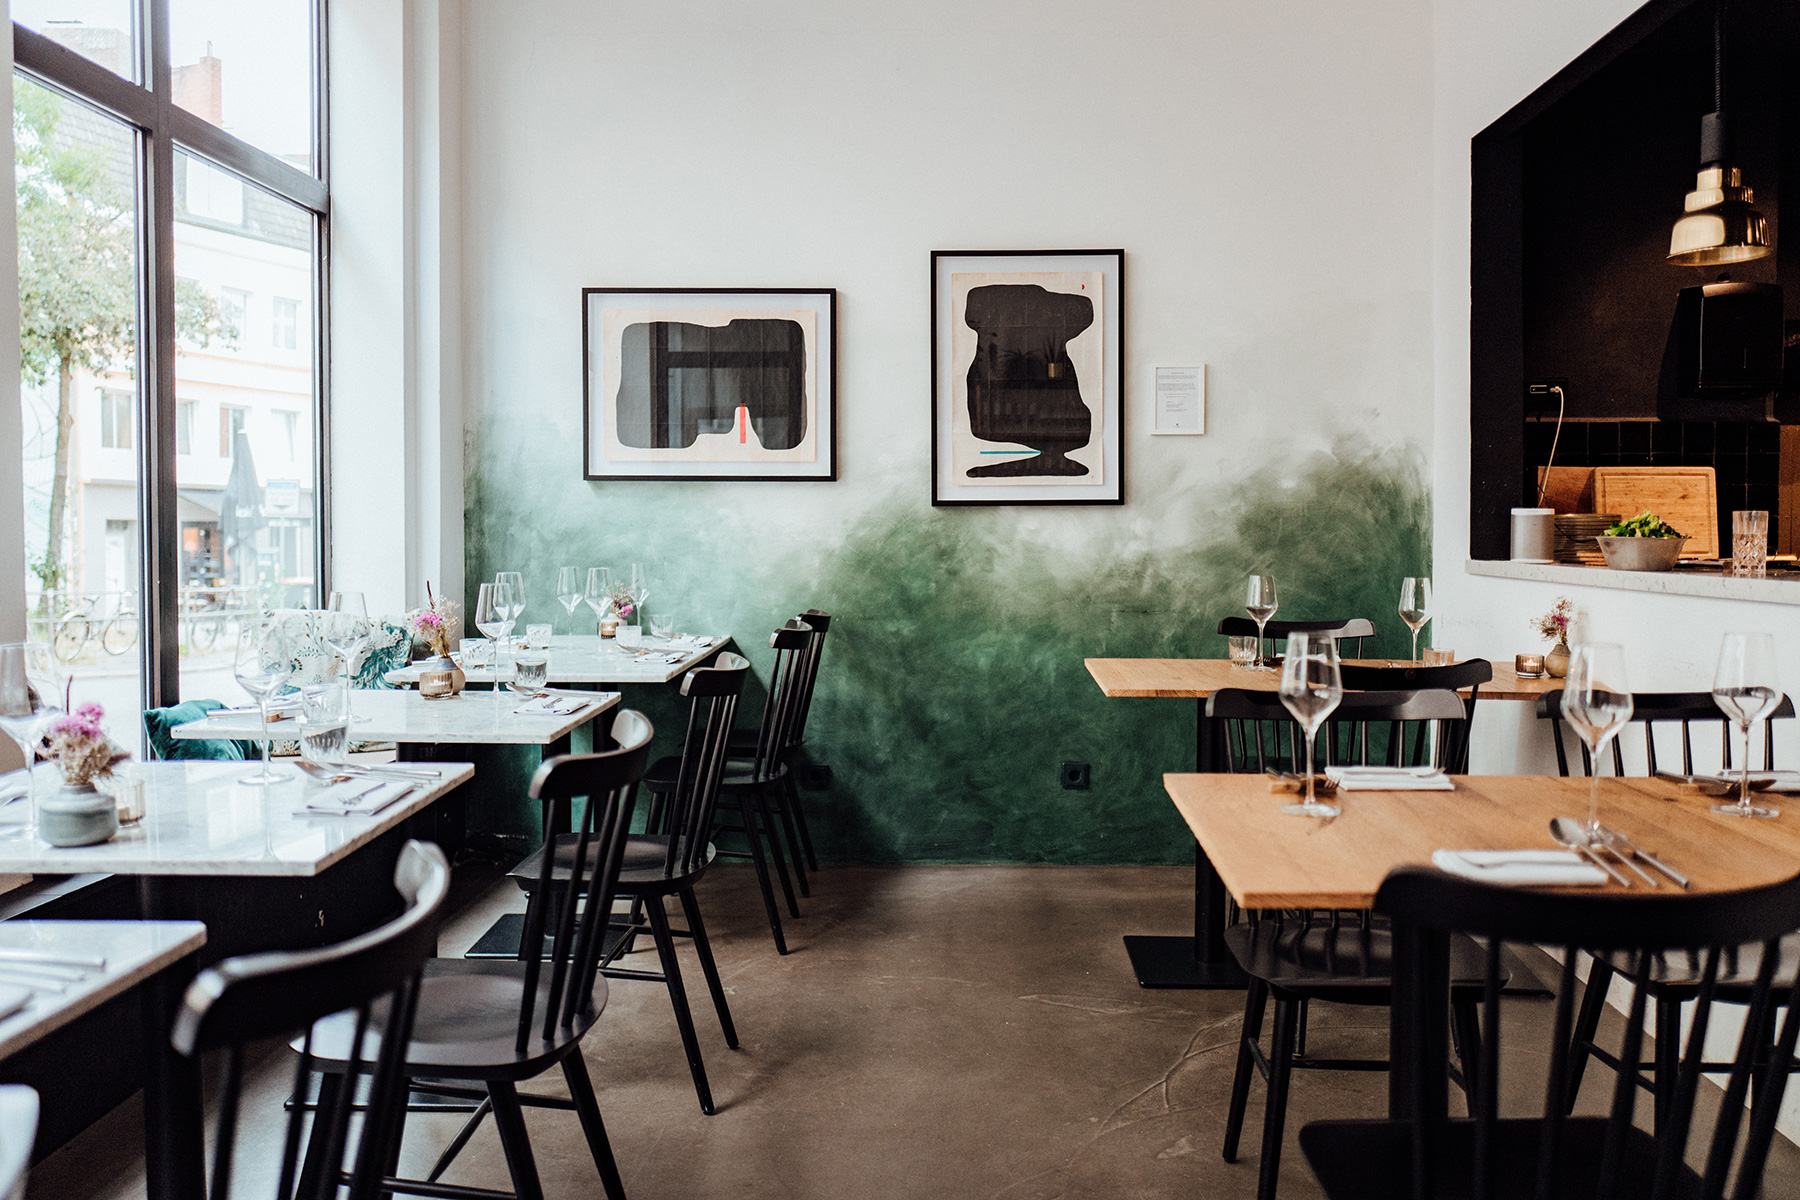 Geheimtipp Hamburg St Pauli Restaurant Haebel Lisa Knauer 1